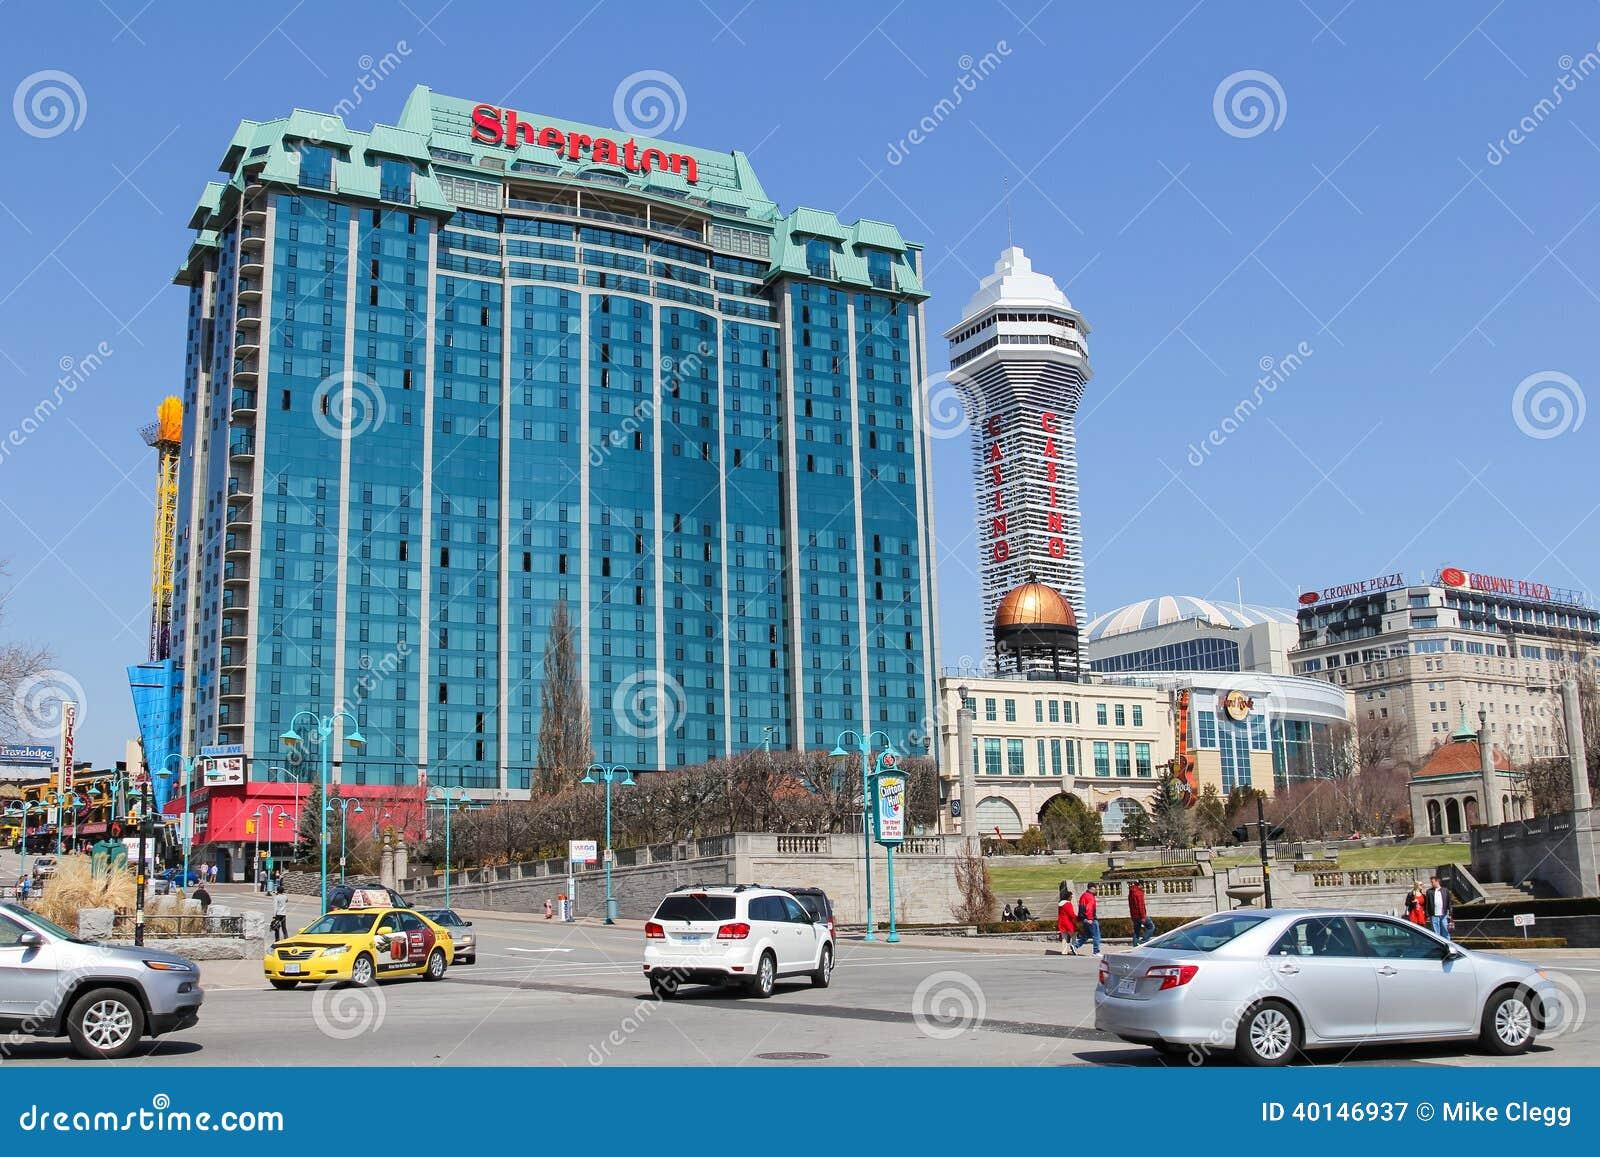 Niagara falls canada casino address everlast poker